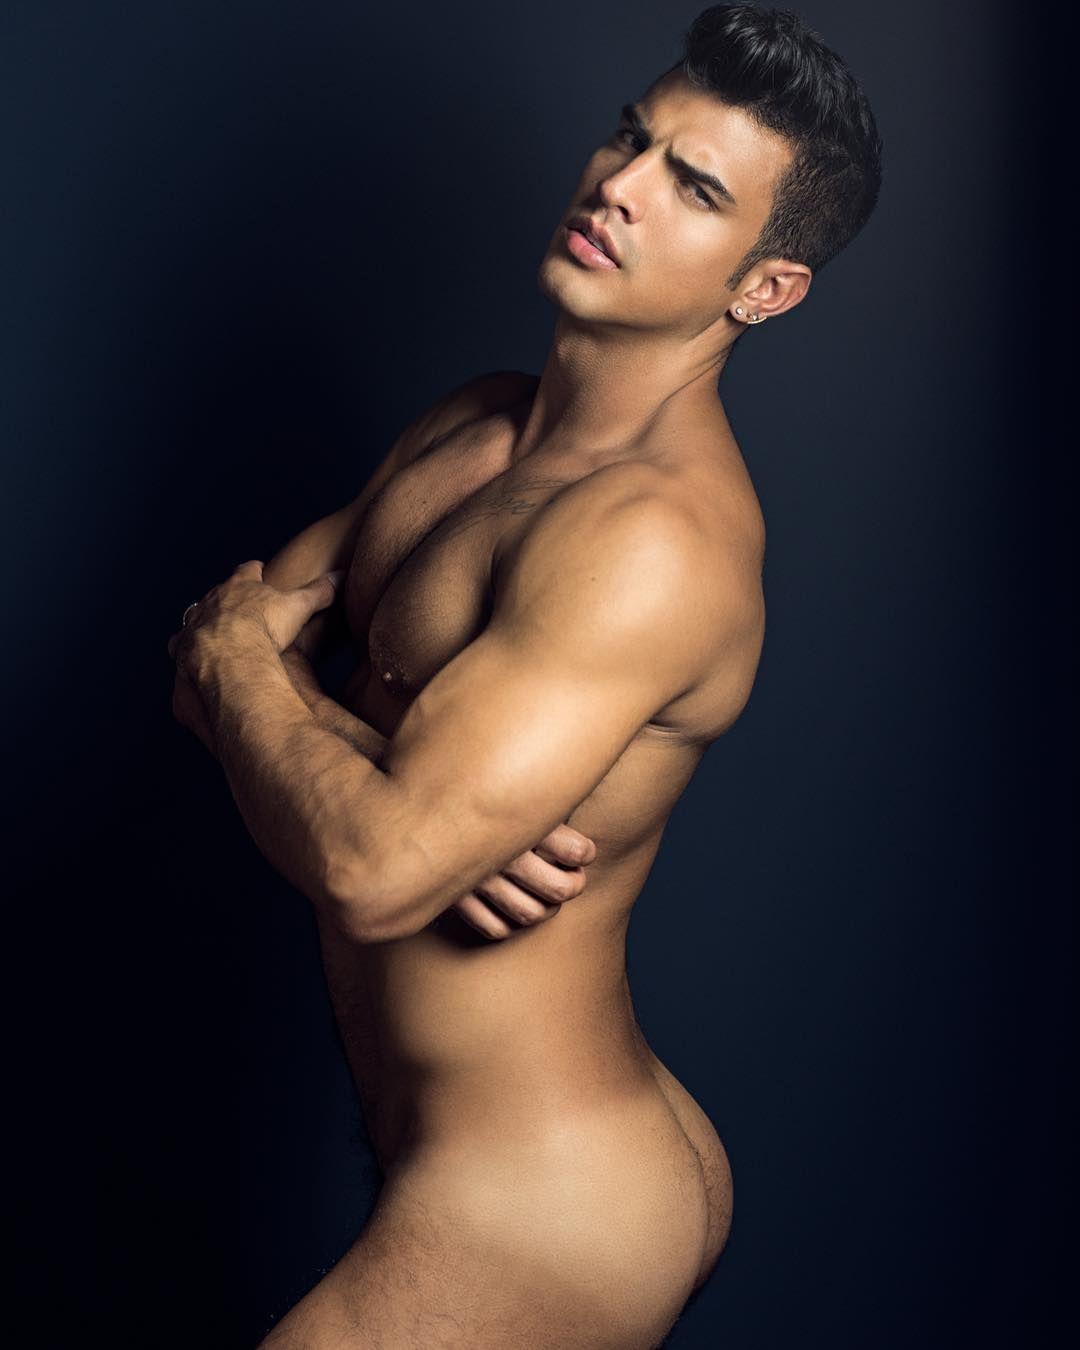 Hot male mexican model naked, wonder girls so hot mv hq